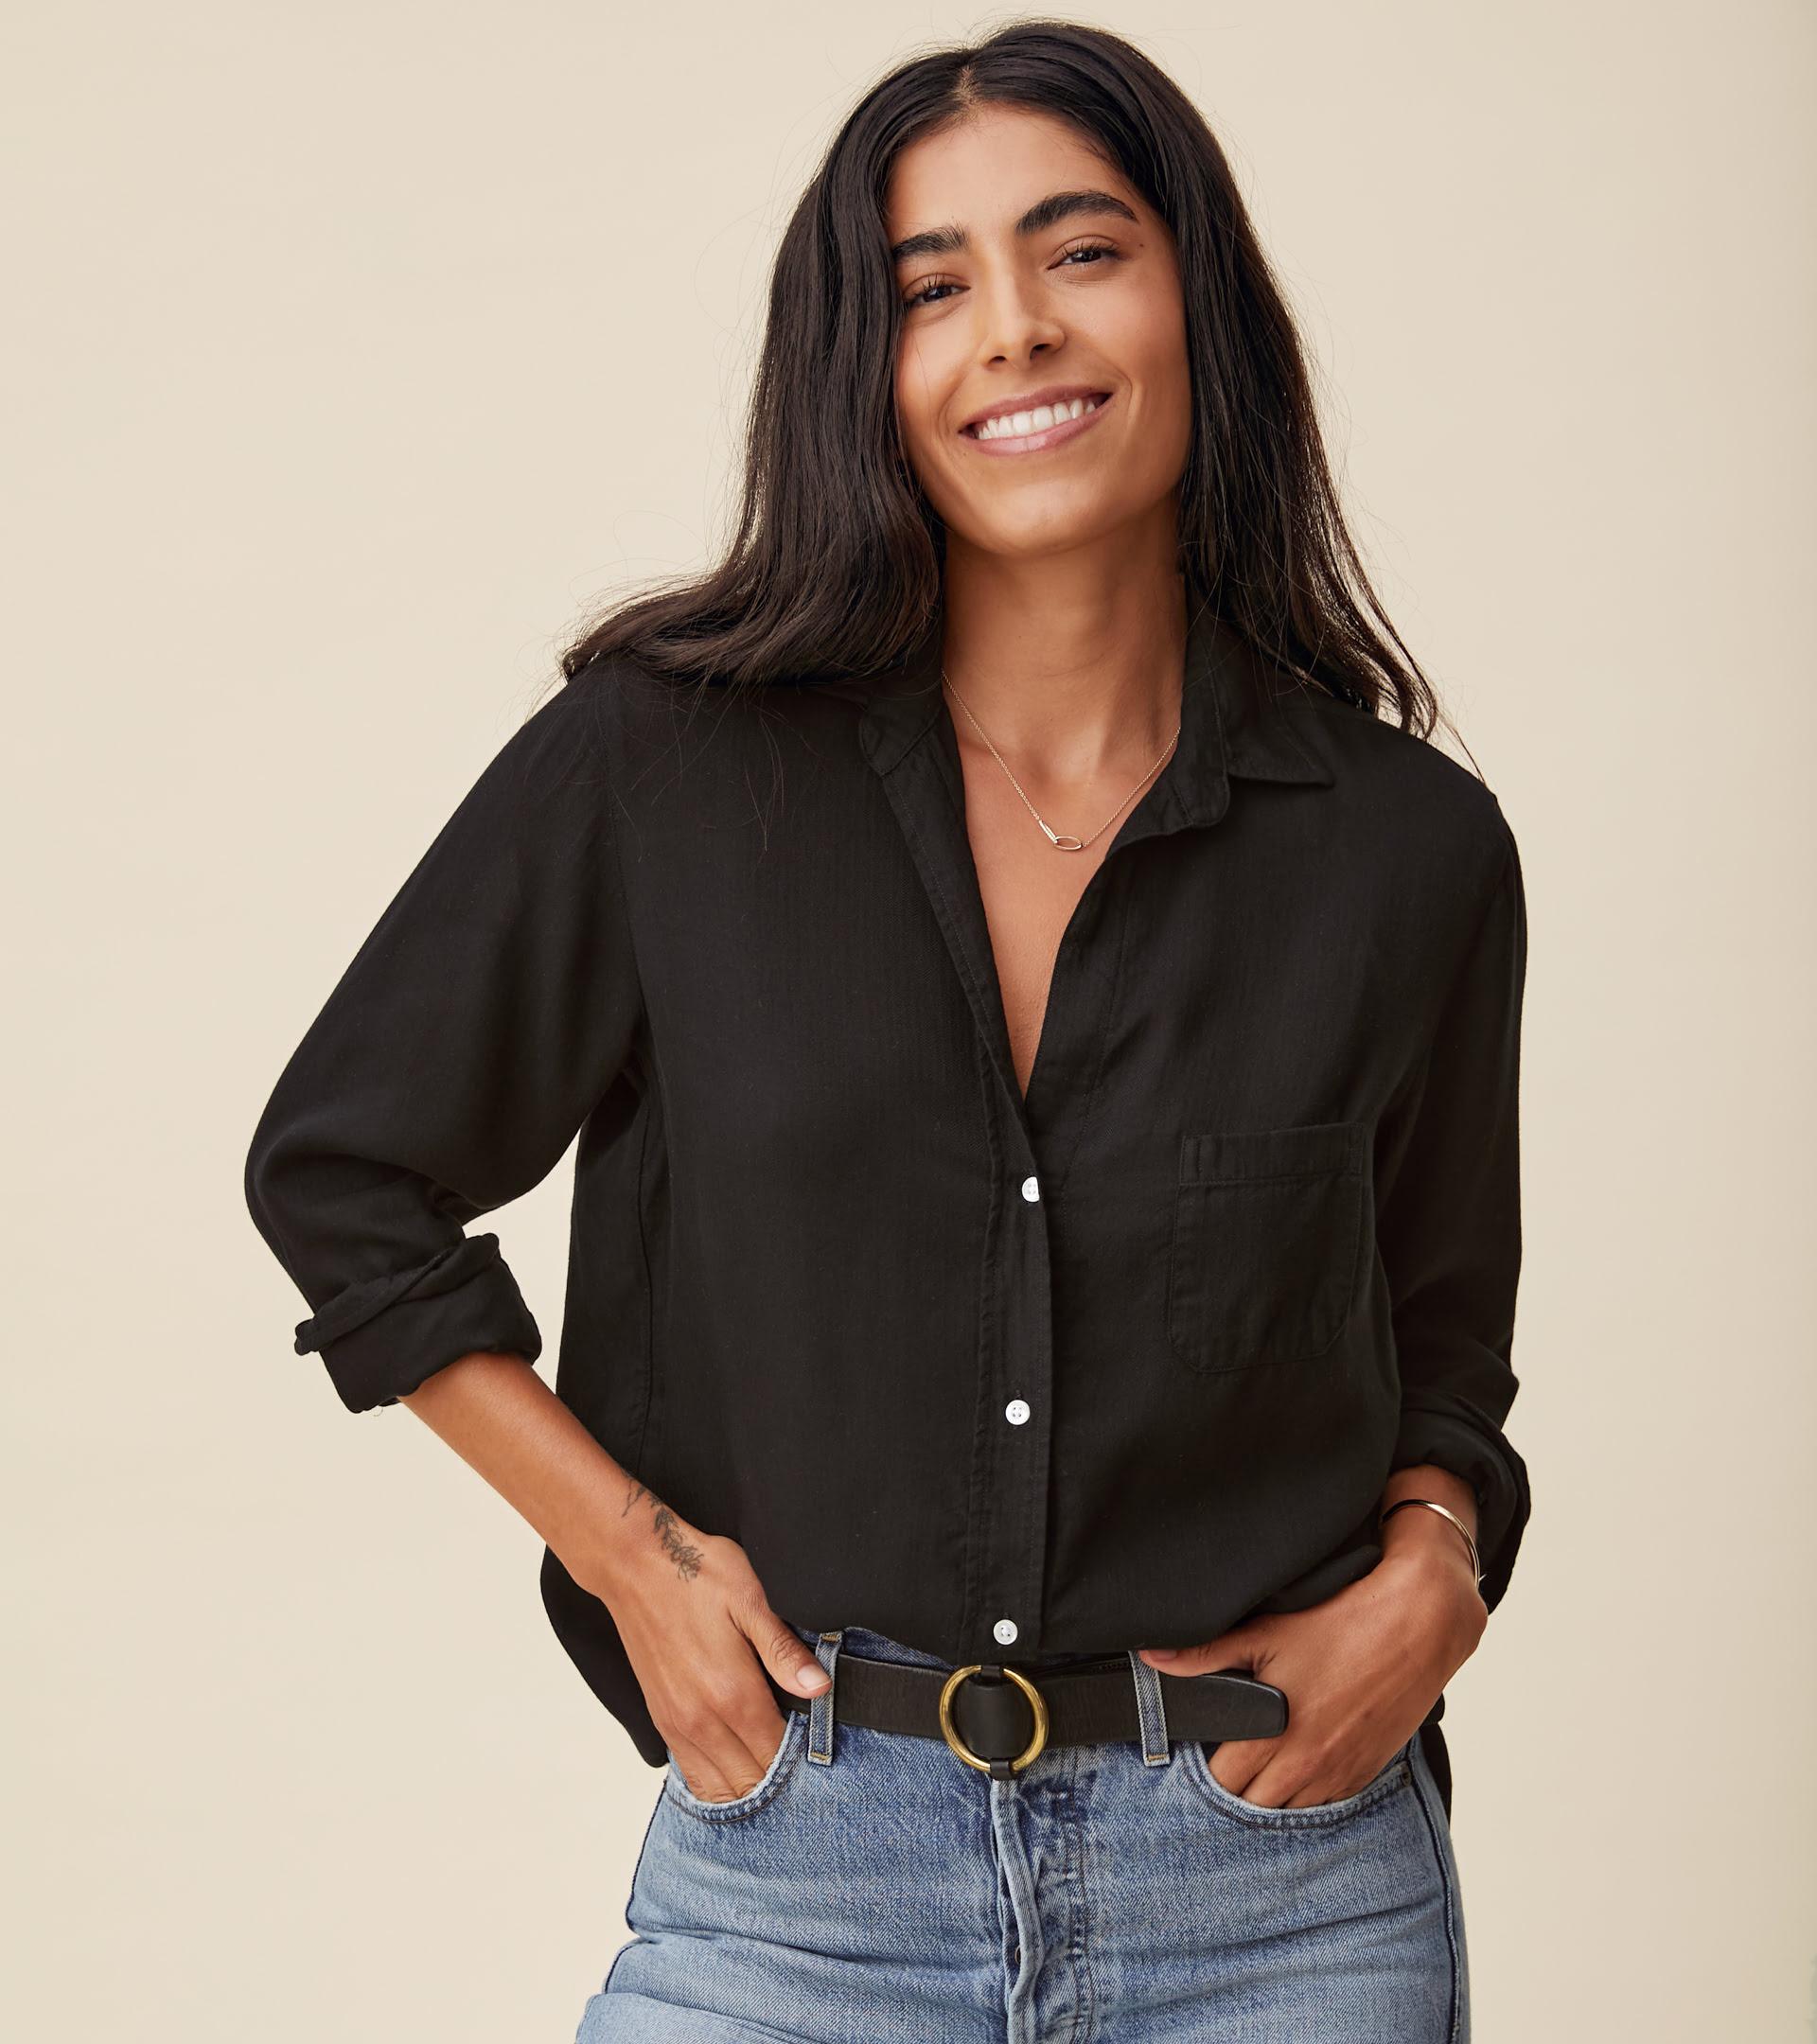 The Hero Button-Up Shirt Black, Liquid Flannel view 1